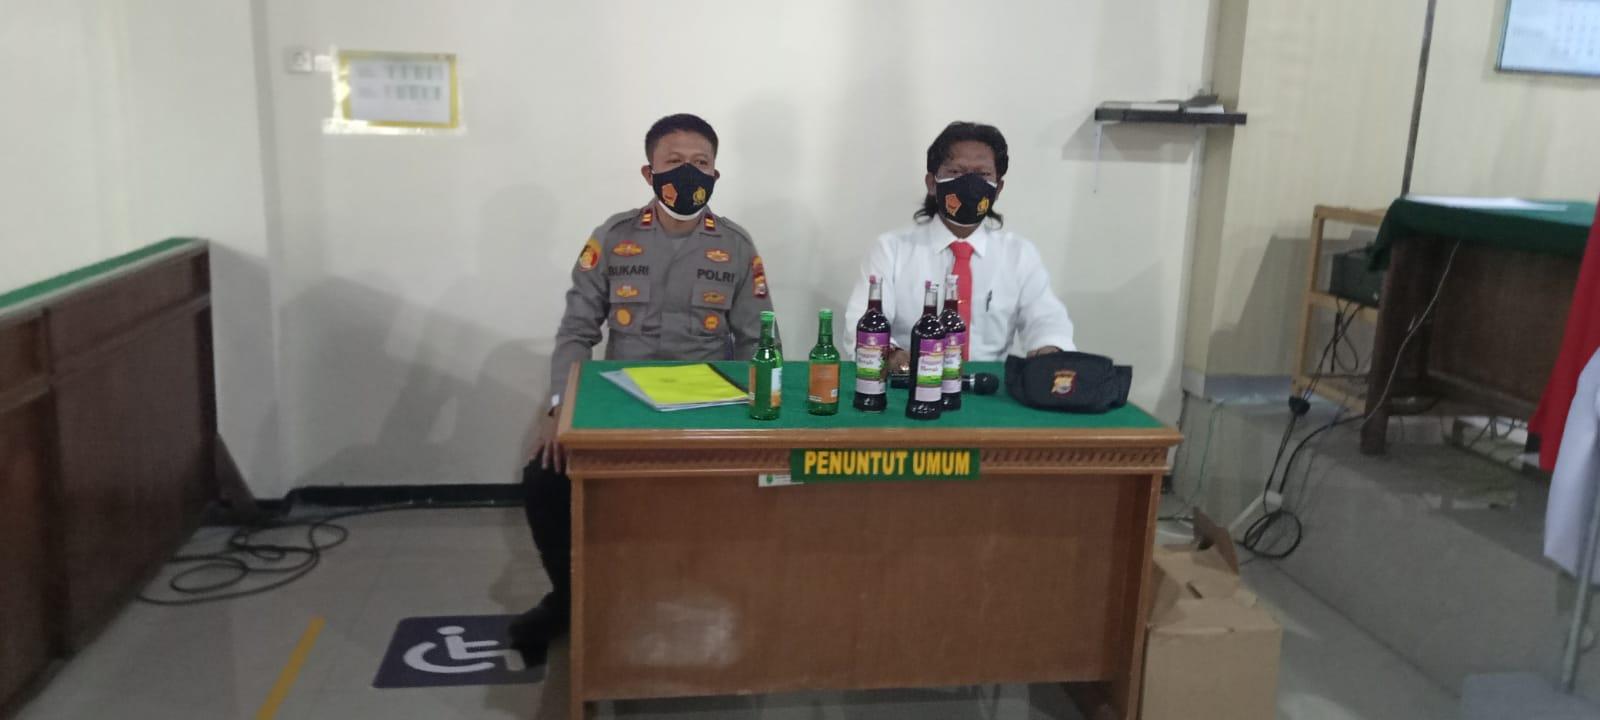 Sidang Tipiring, Penjual Miras Tanpa Ijin Didenda Dua Juta